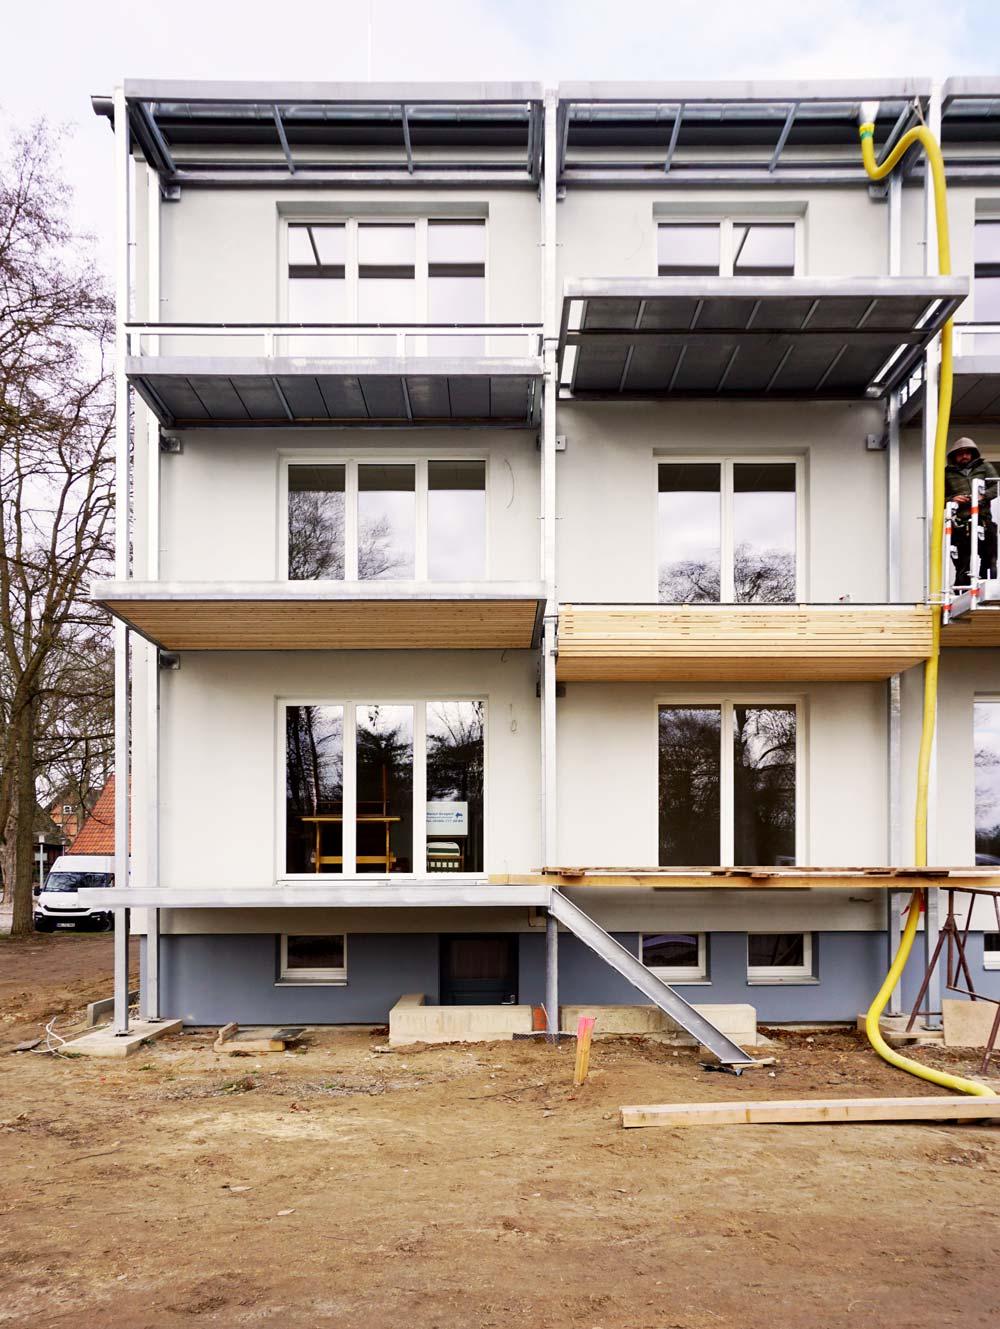 STUDIOKUBIK-architektur-architecture-berlin-Umbau-g21-balkon-baustelle4